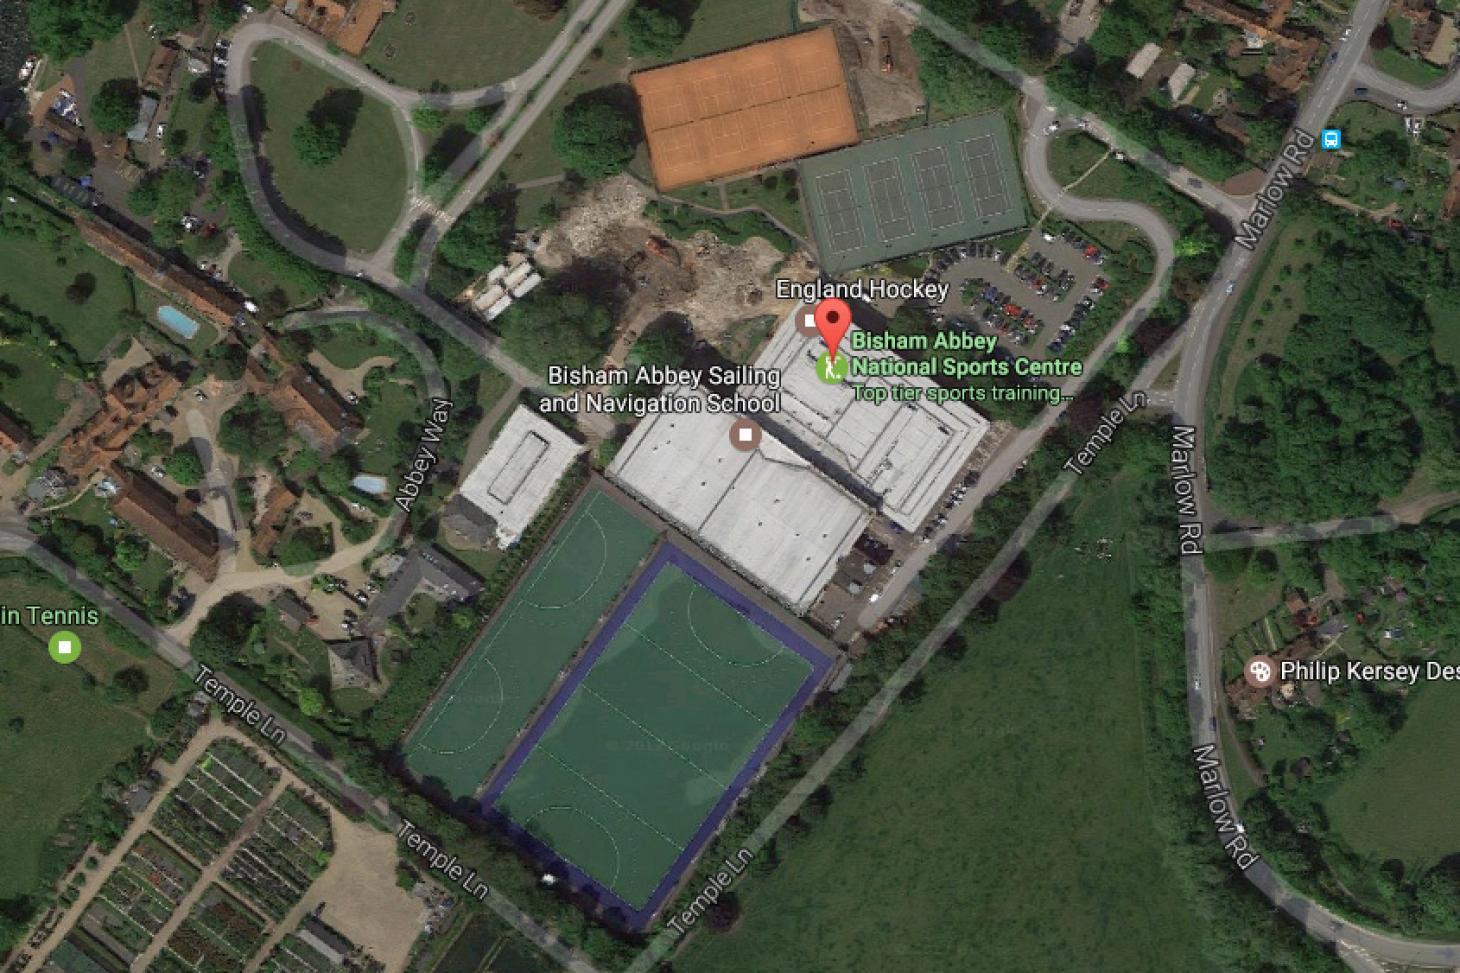 Bisham Abbey National Sports Centre Outdoor   3G Astroturf hockey pitch